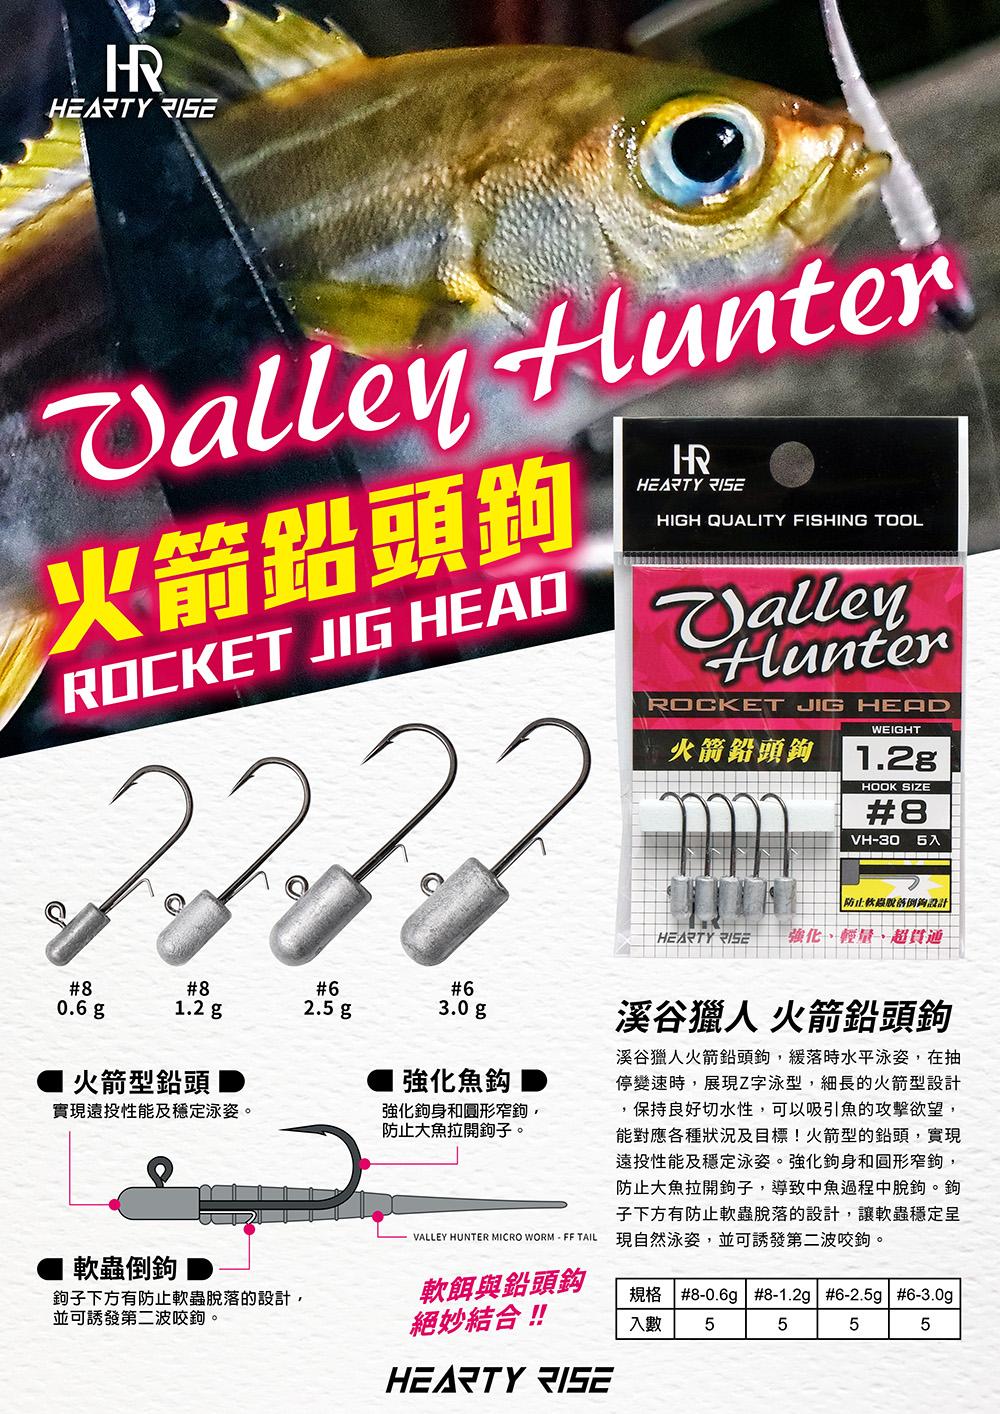 HR VALLEY HUNTER 溪谷獵人 火箭鉛頭鉤 VH-30 1000